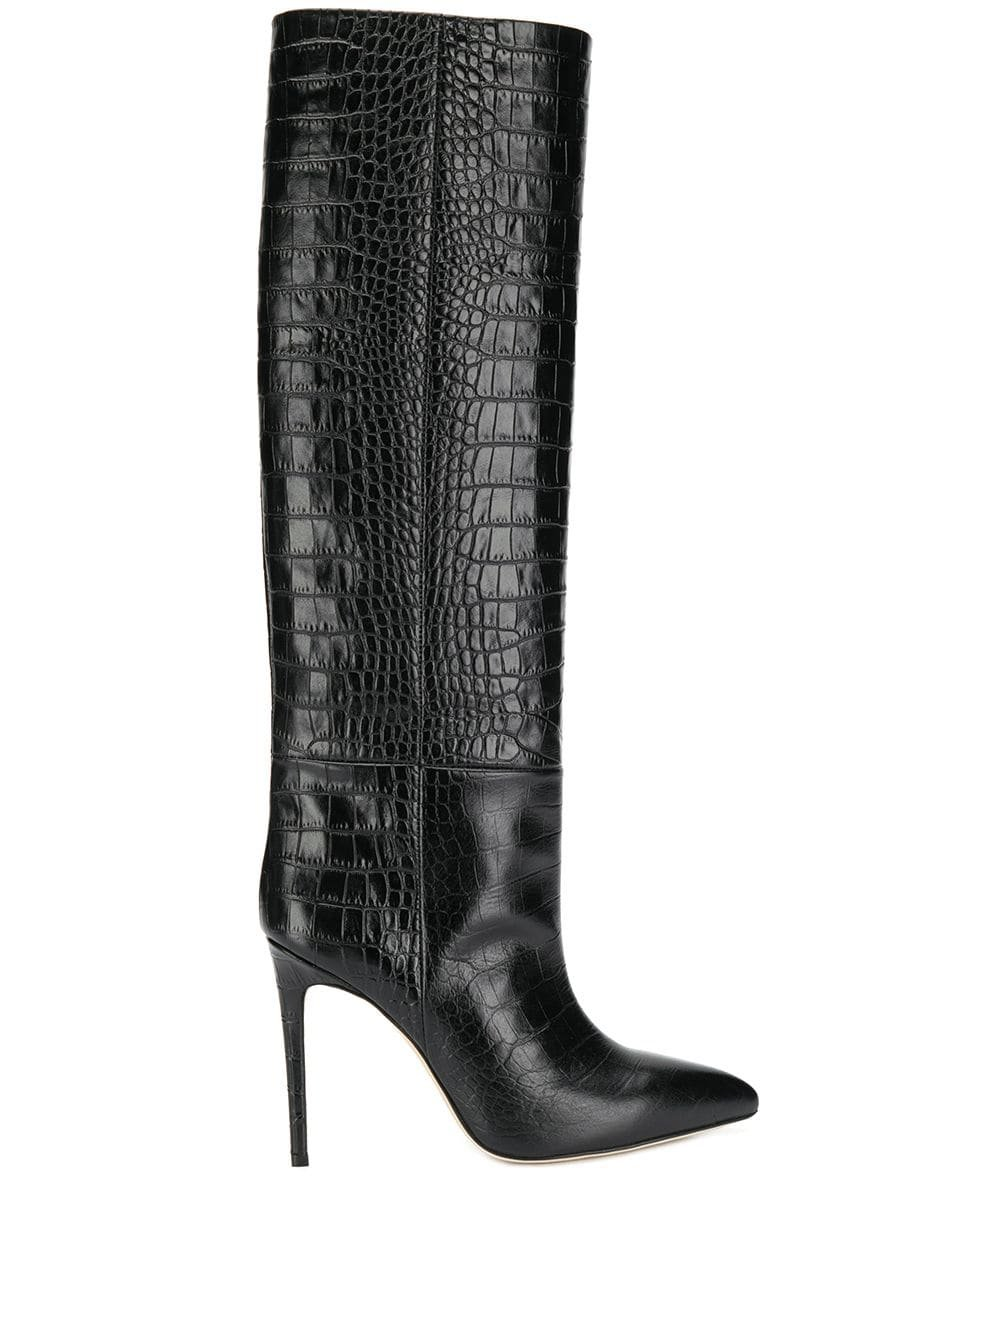 Paris Texas Croco long boots £517 - Fast Global Shipping, Free Returns